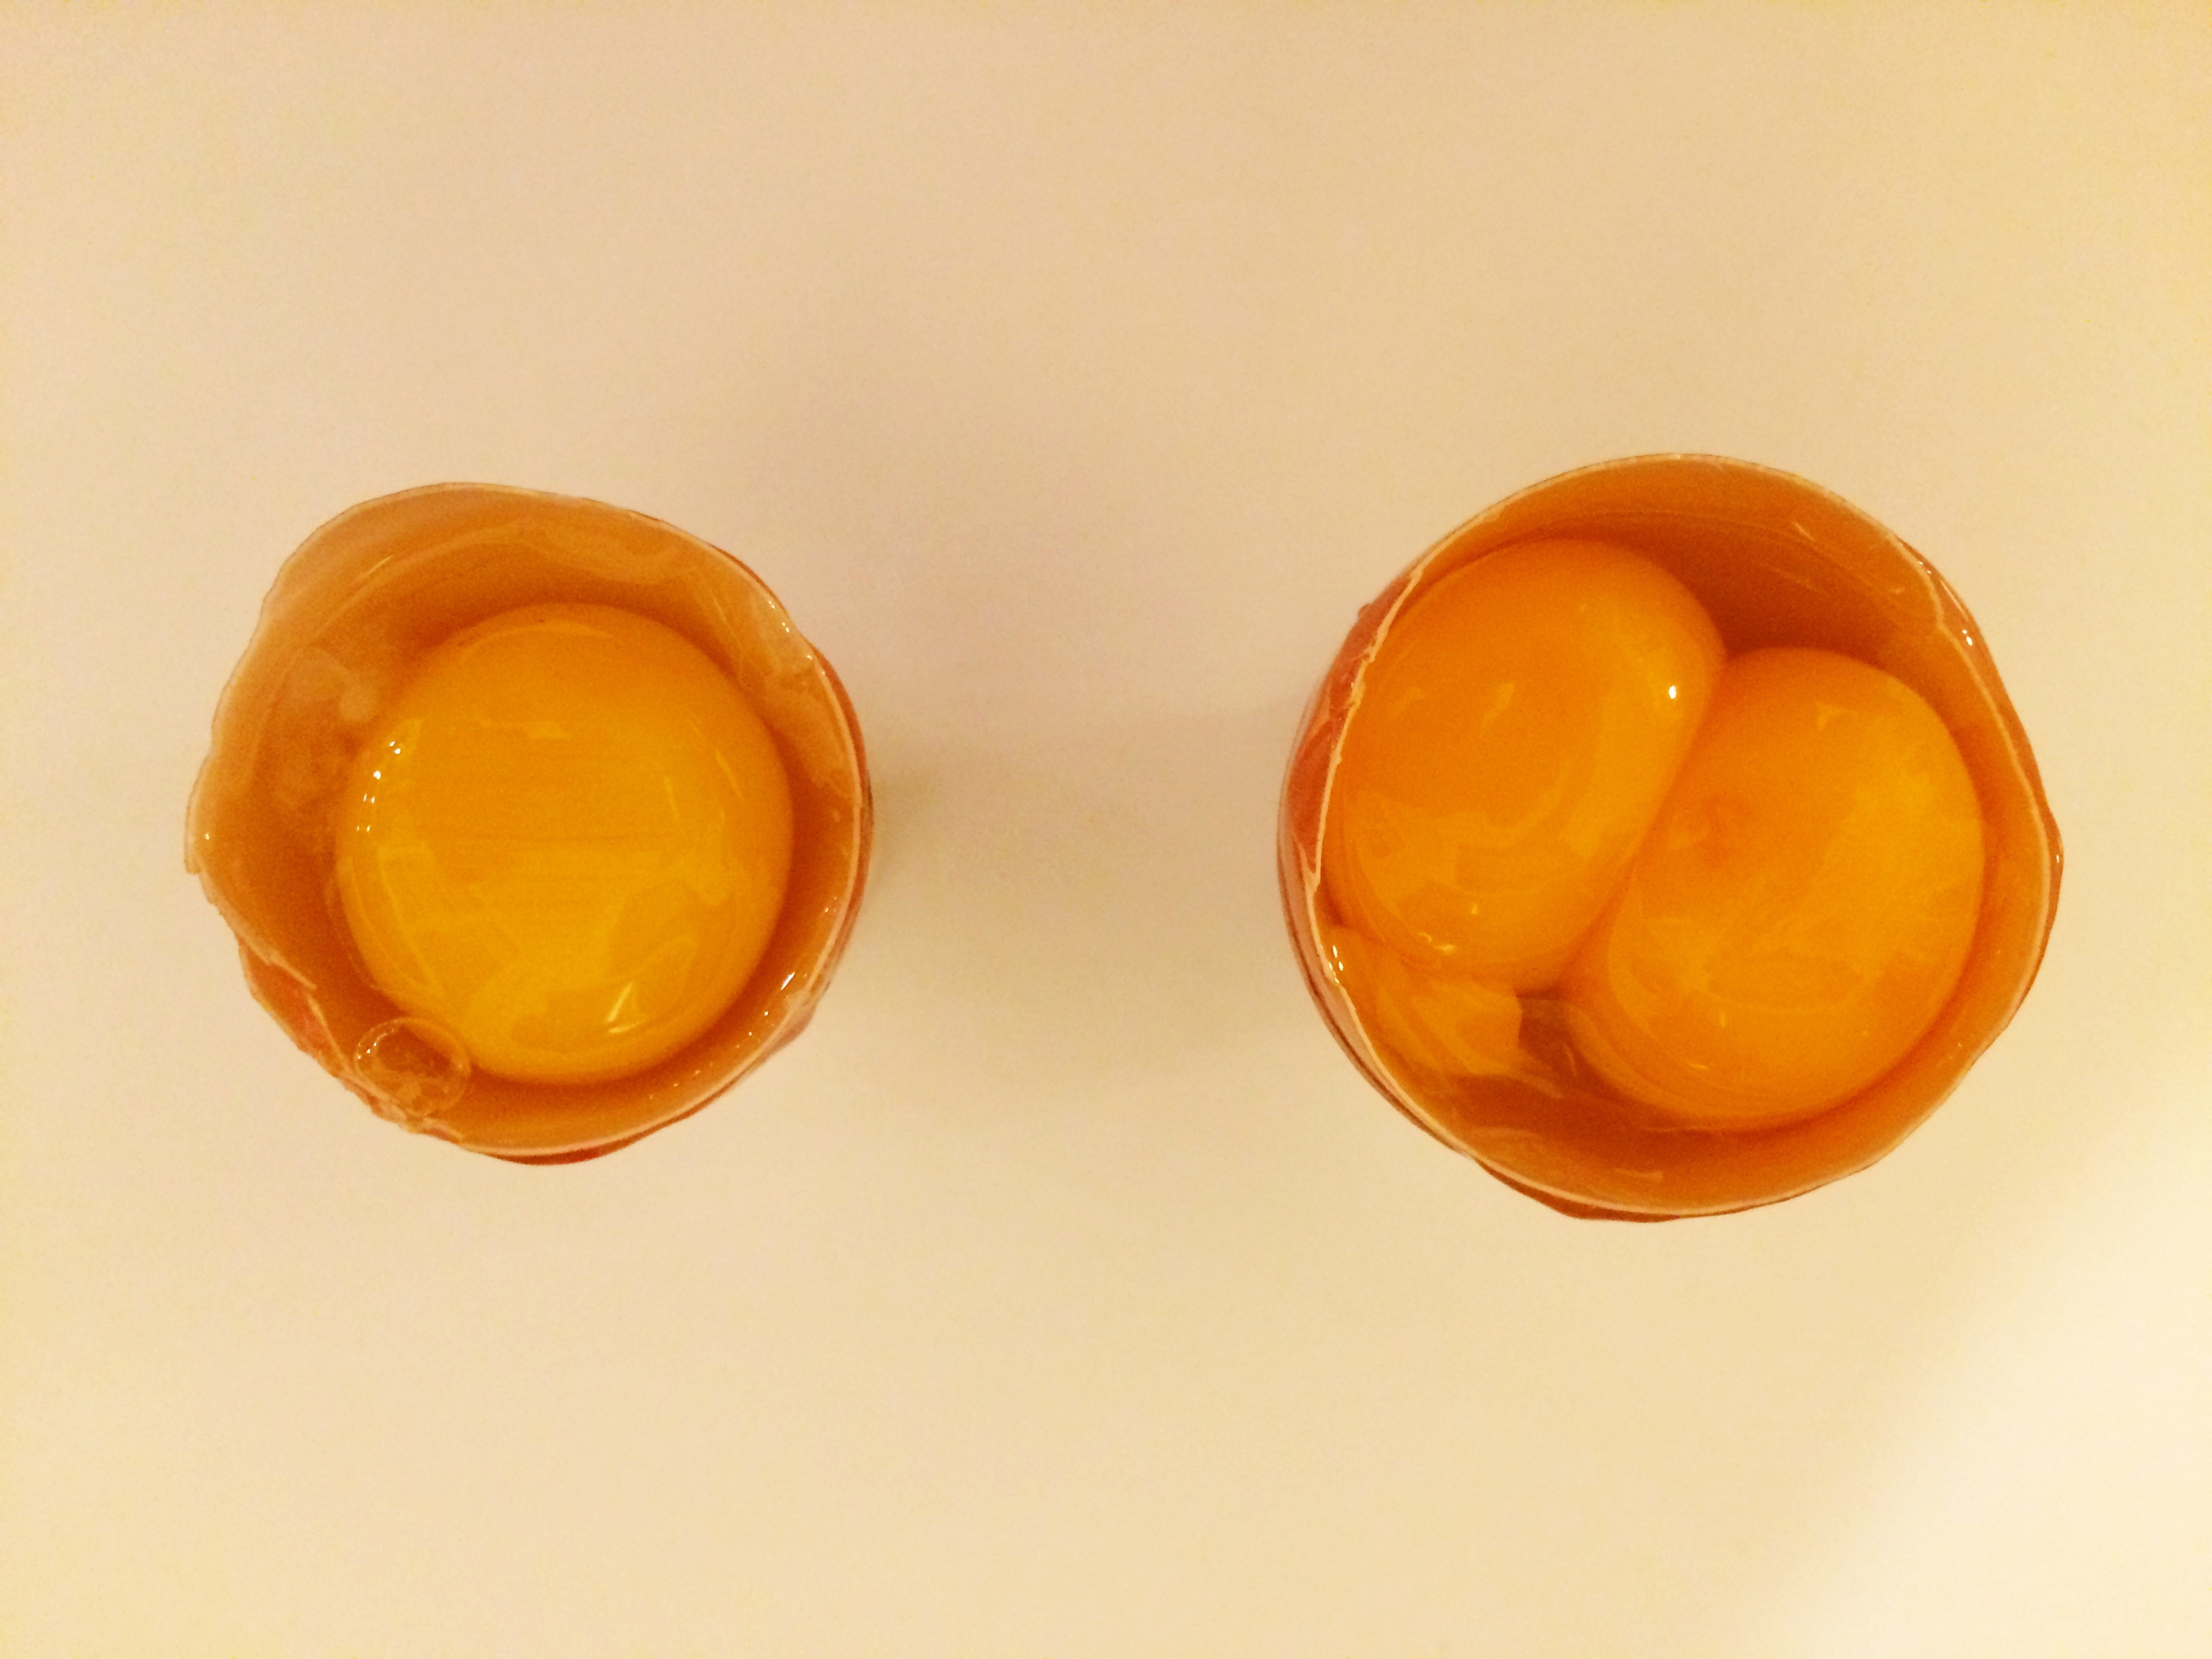 wiki egg as food upcscavenger